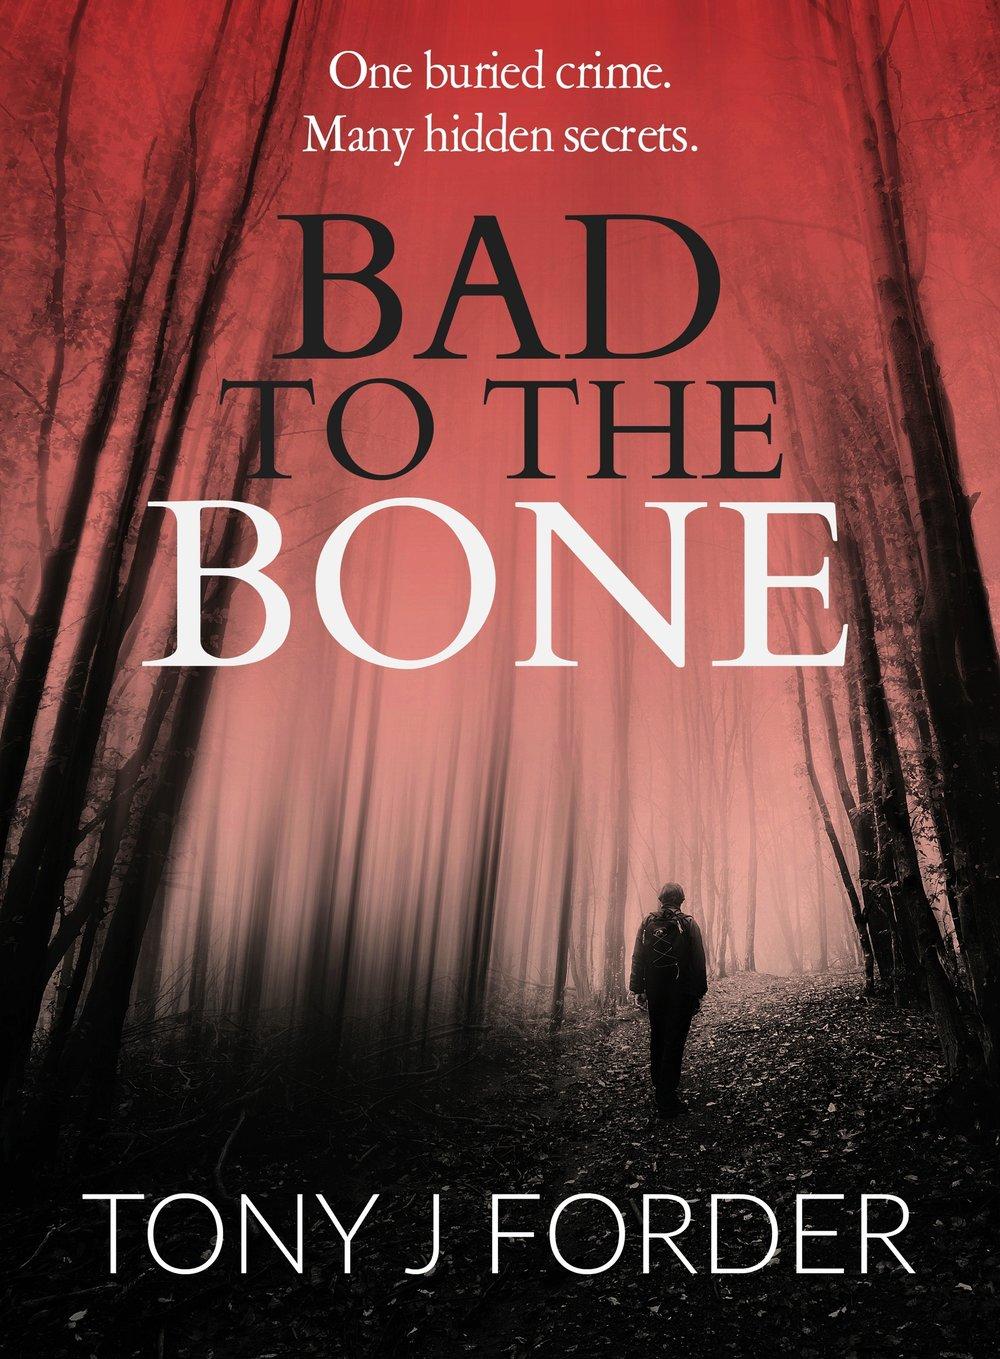 Bad-to-the-Bone-Kindle.jpg